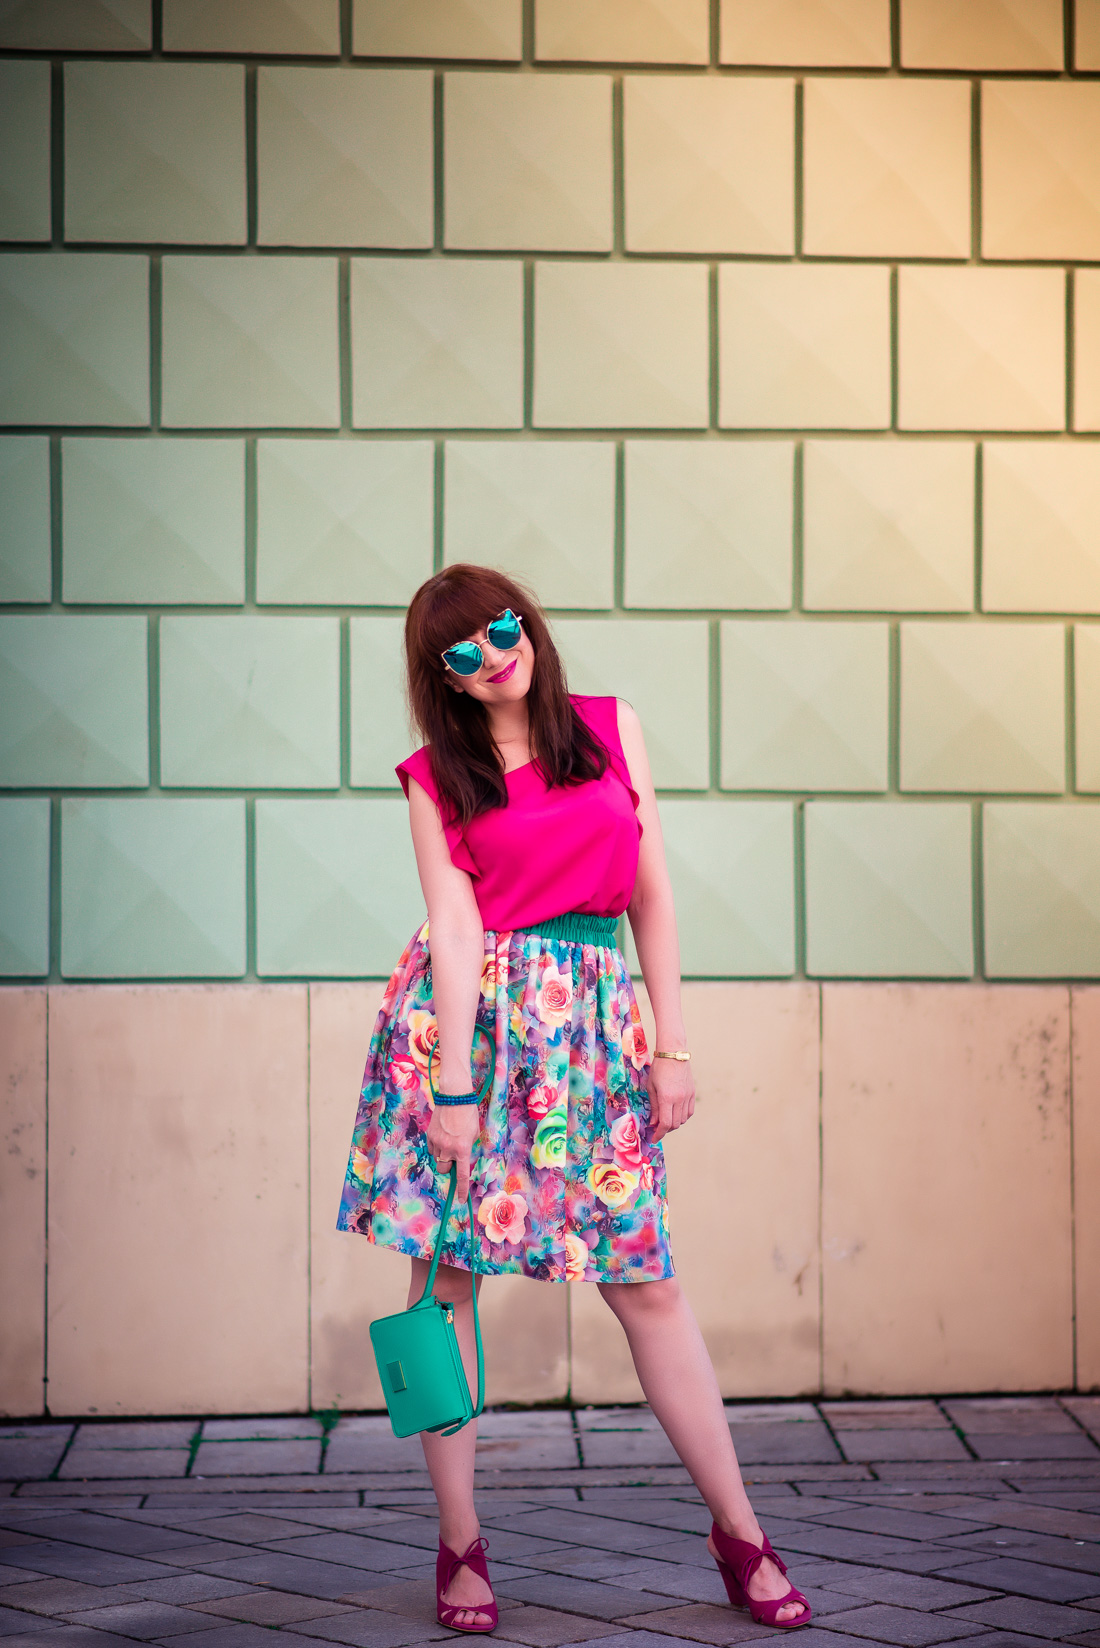 MAMA JE MAMA & KVETINOVÁ SUKŇA_Katharine-fashion is beautiful_blog 16_Kvetinová sukňa_Zelená kabelka Answear_Katarína Jakubčová_Fashion blogerka